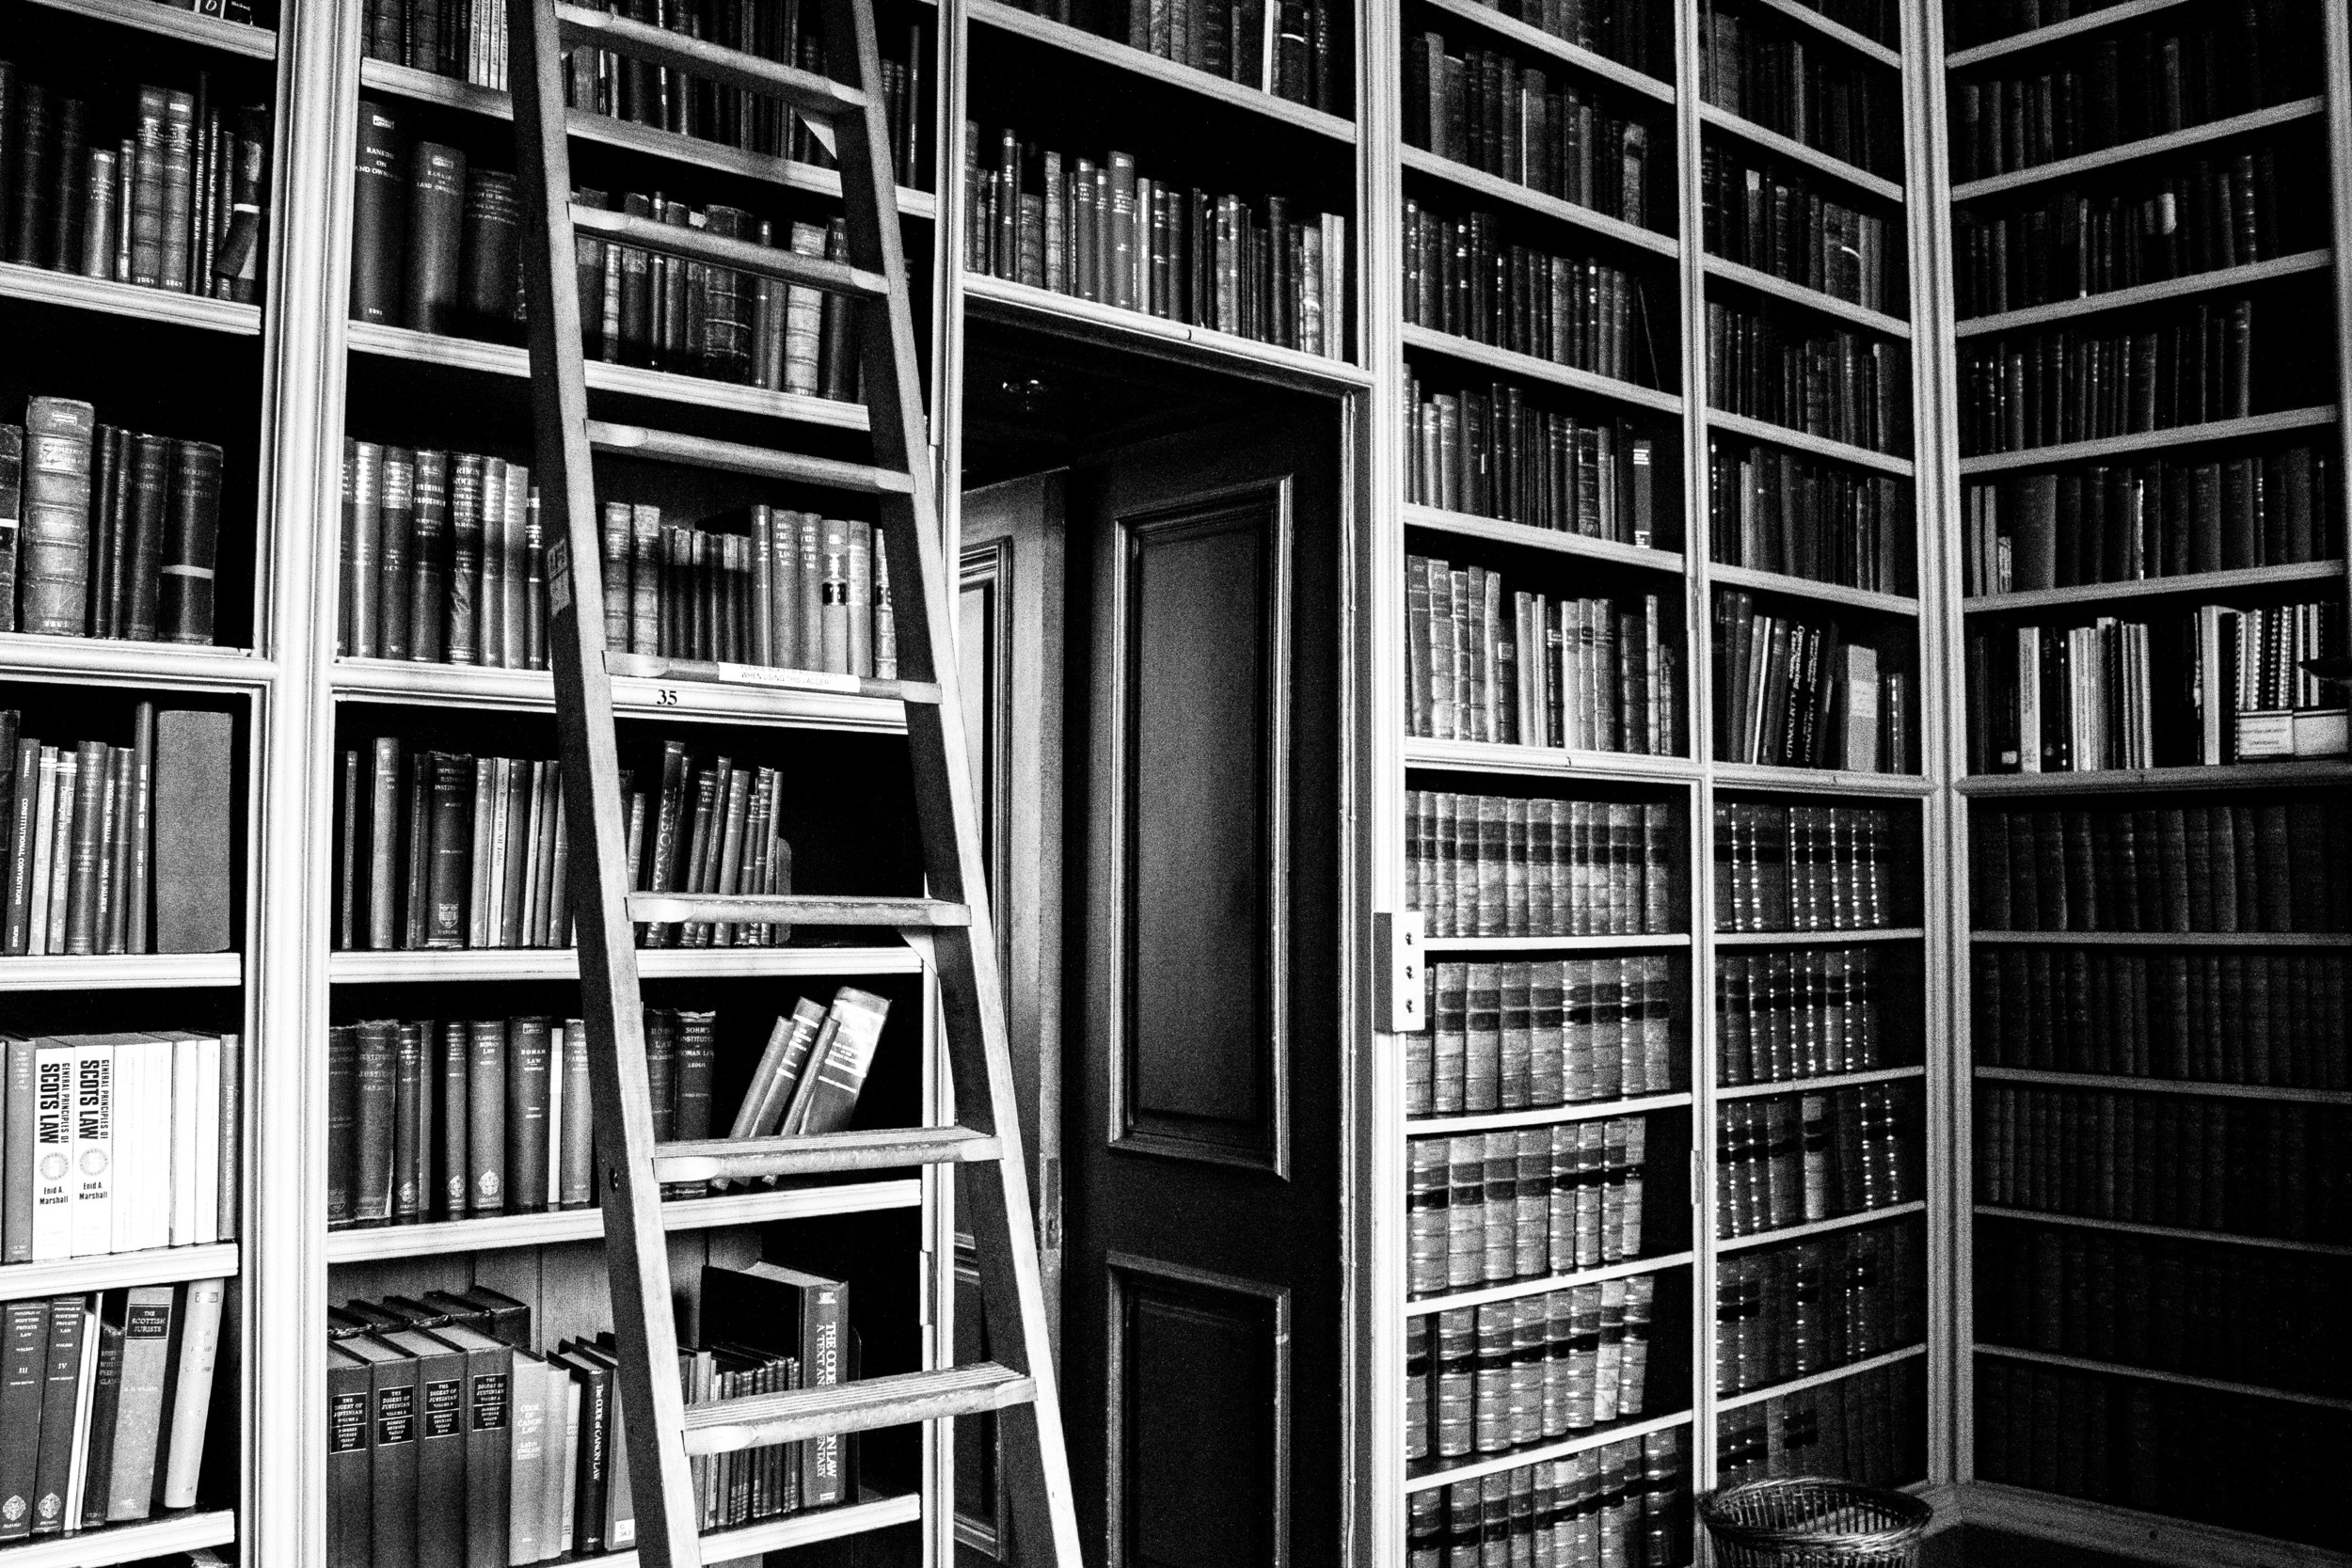 Library Binding